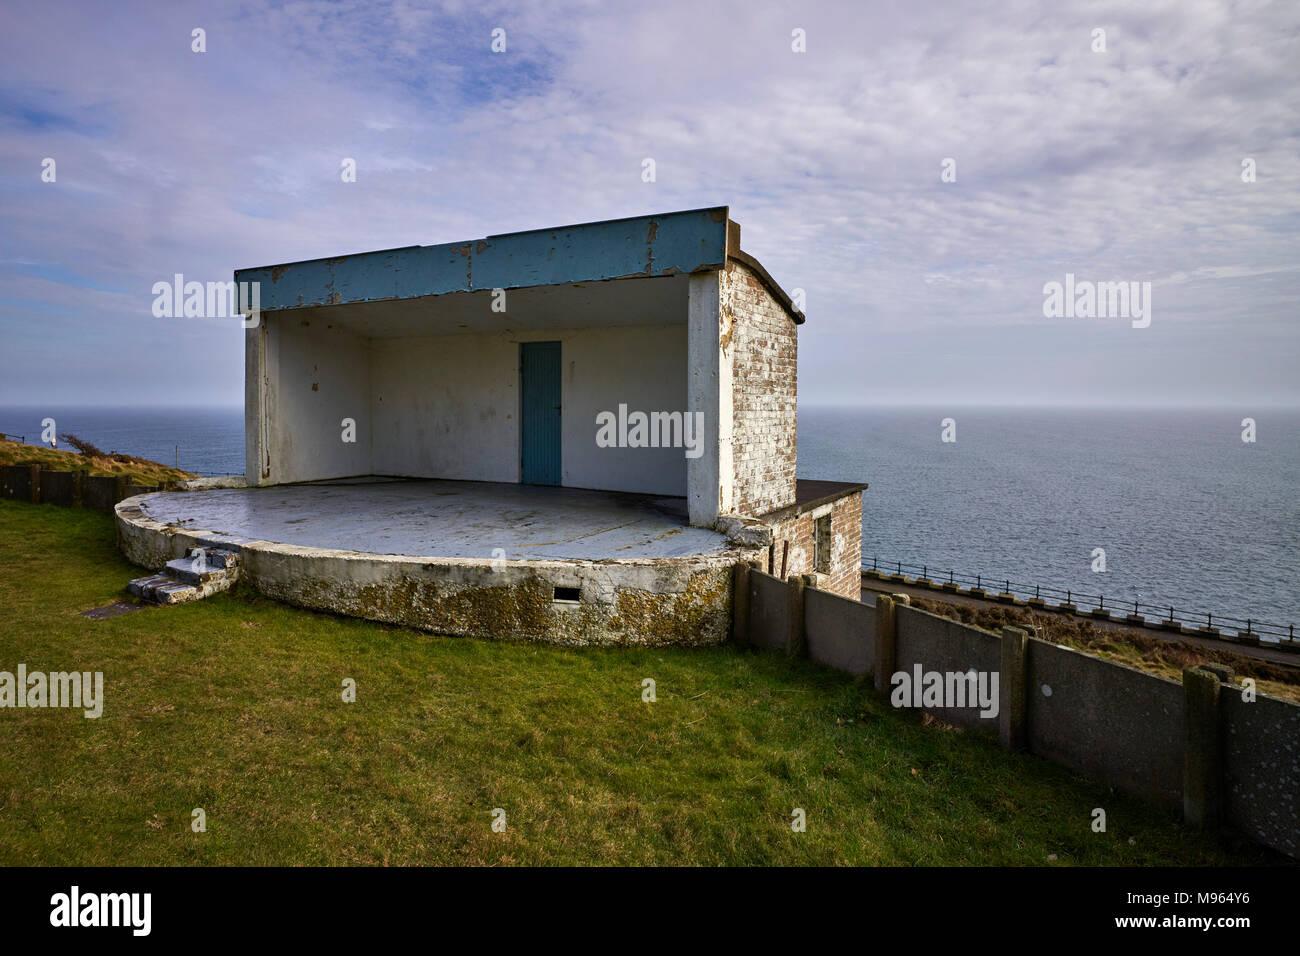 The no longer used open air theatre overlooking the Irish Sea on Douglas Head in Douglas, Isle of Man - Stock Image